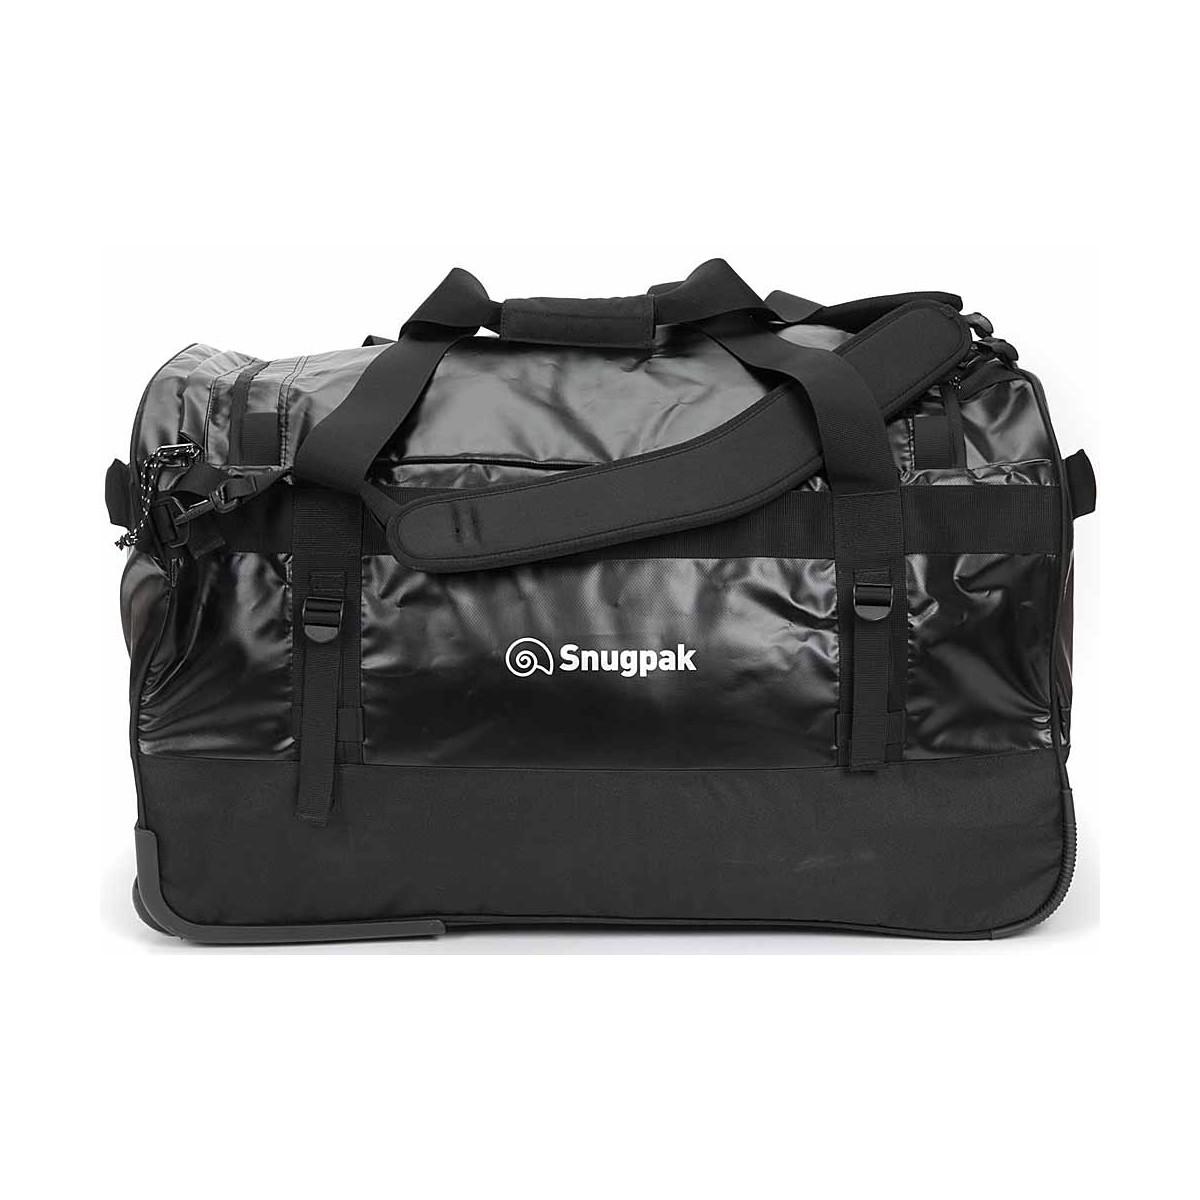 De Sac Monster Kit Imperméable Voyage Roller Snugpak Sacs 120 0N8vmwn